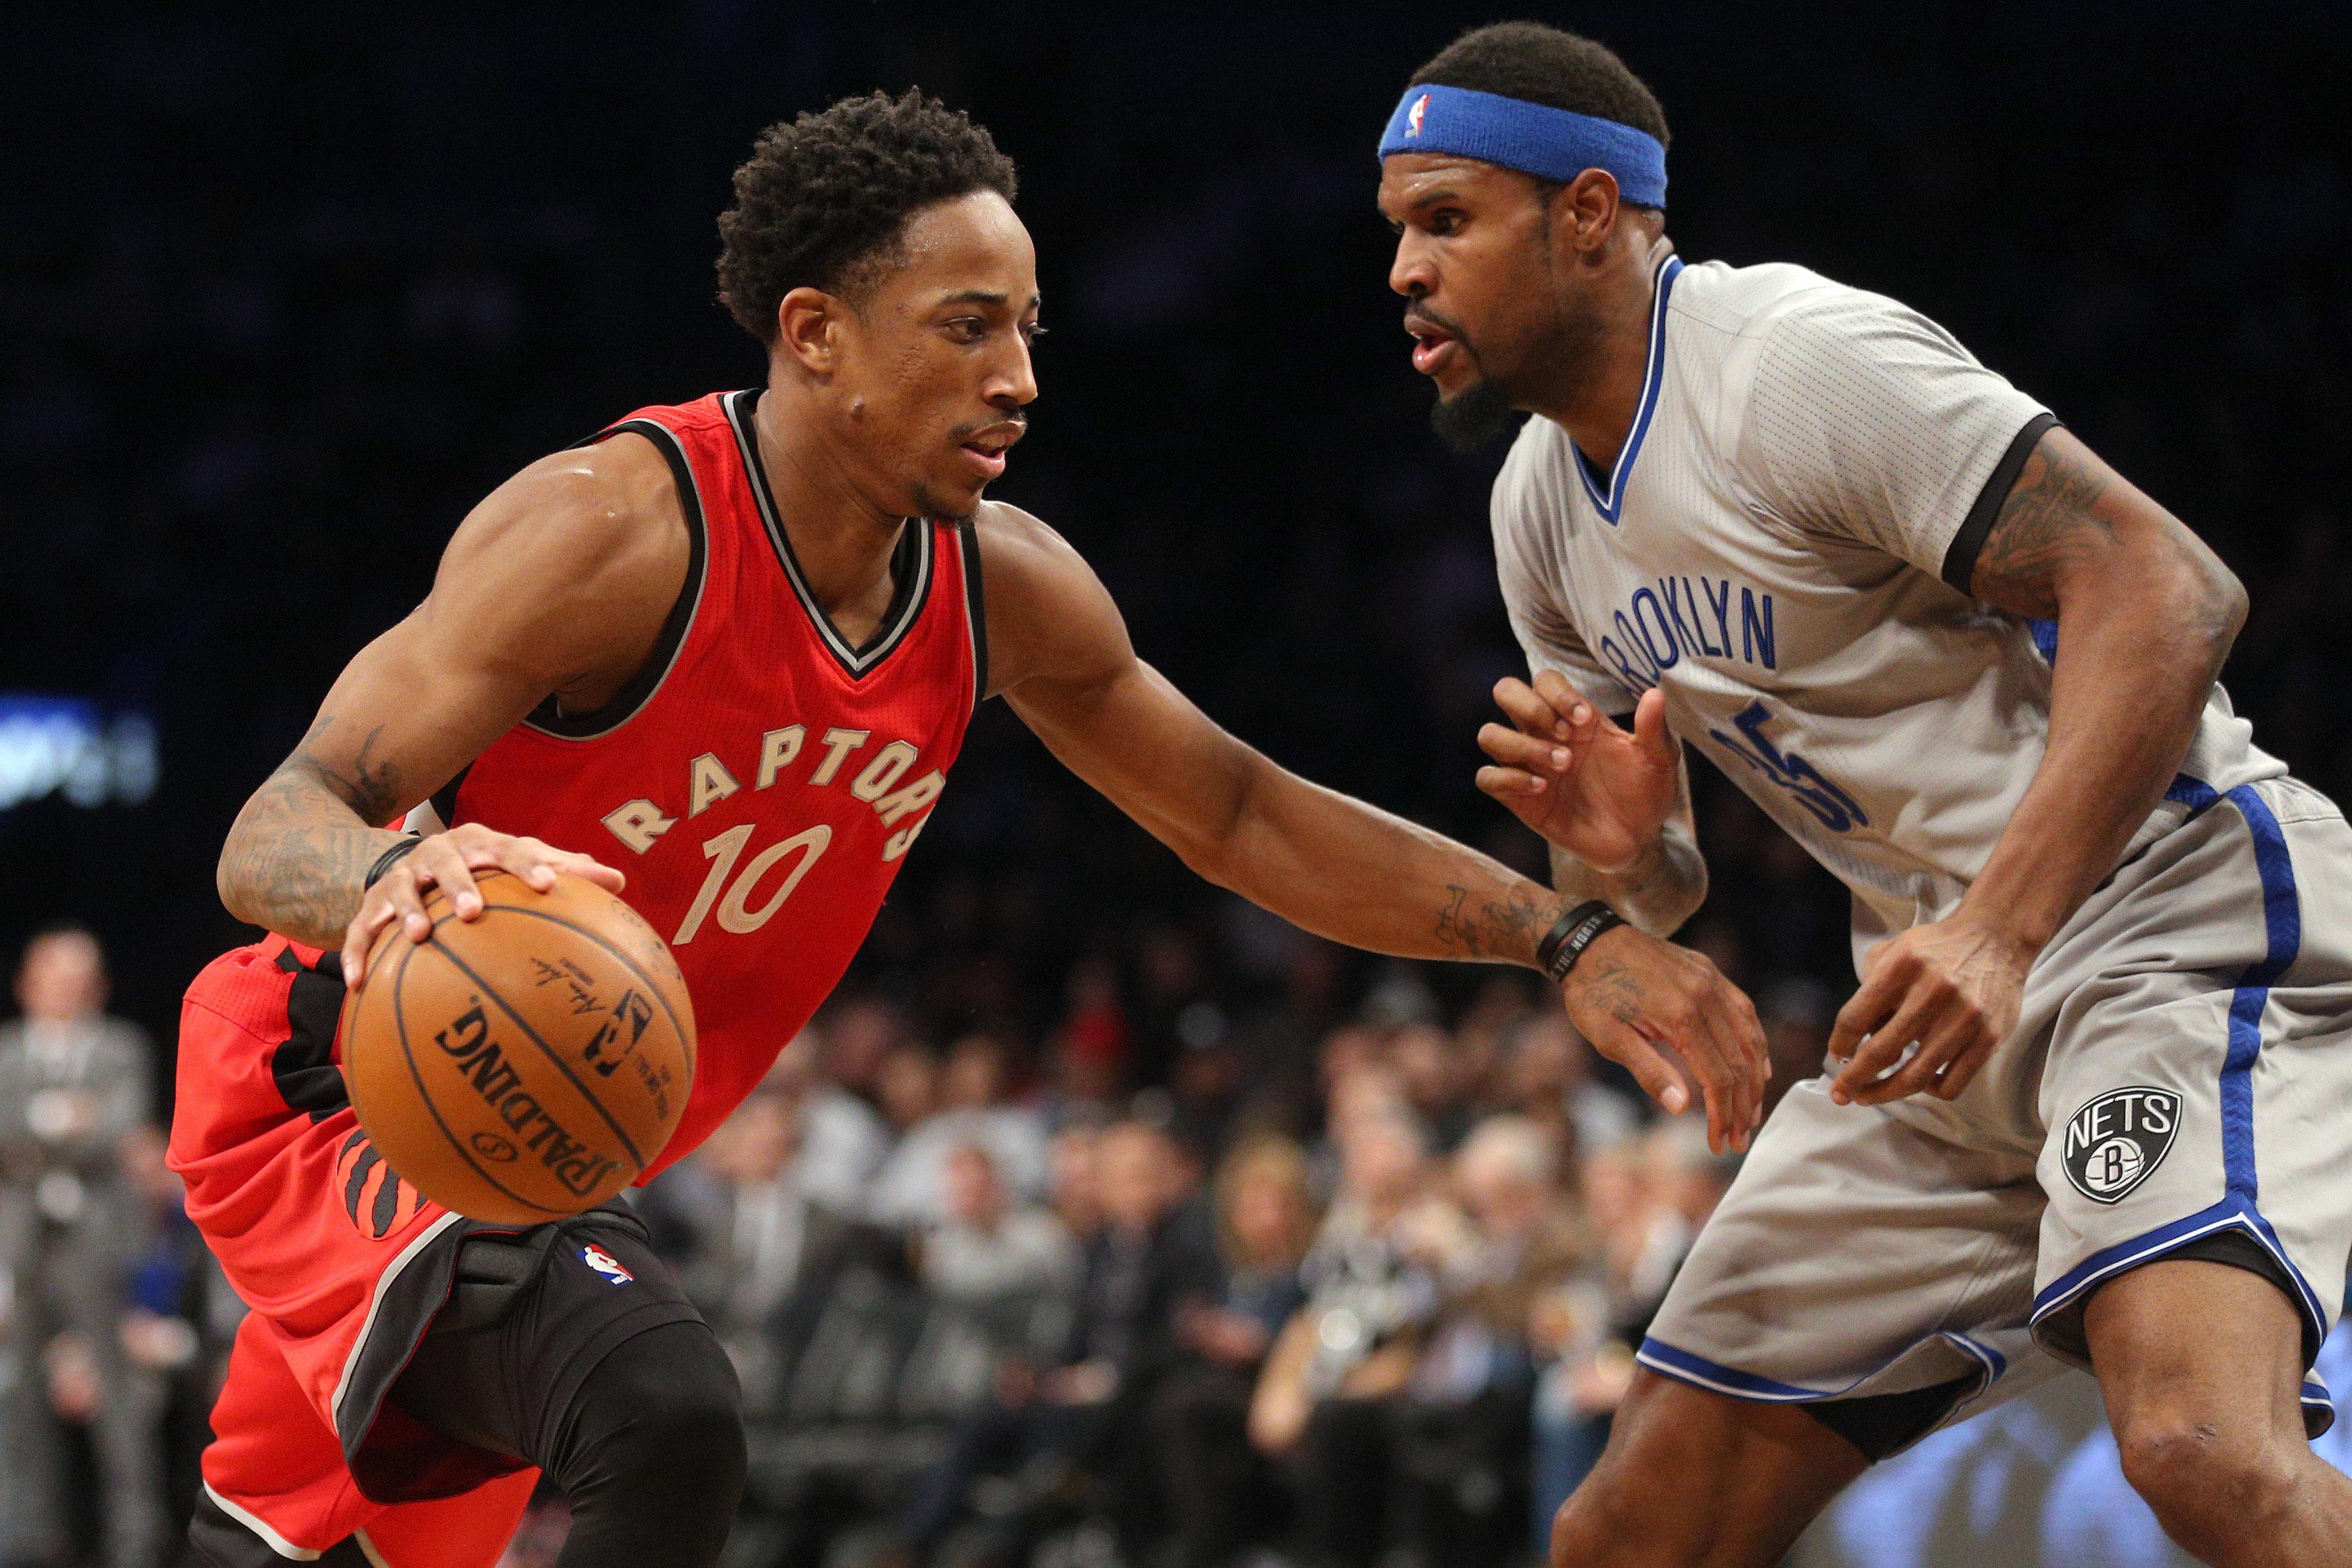 Toronto Raptors: Brooklyn Nets Vs. Toronto Raptors Takeaways And Grades